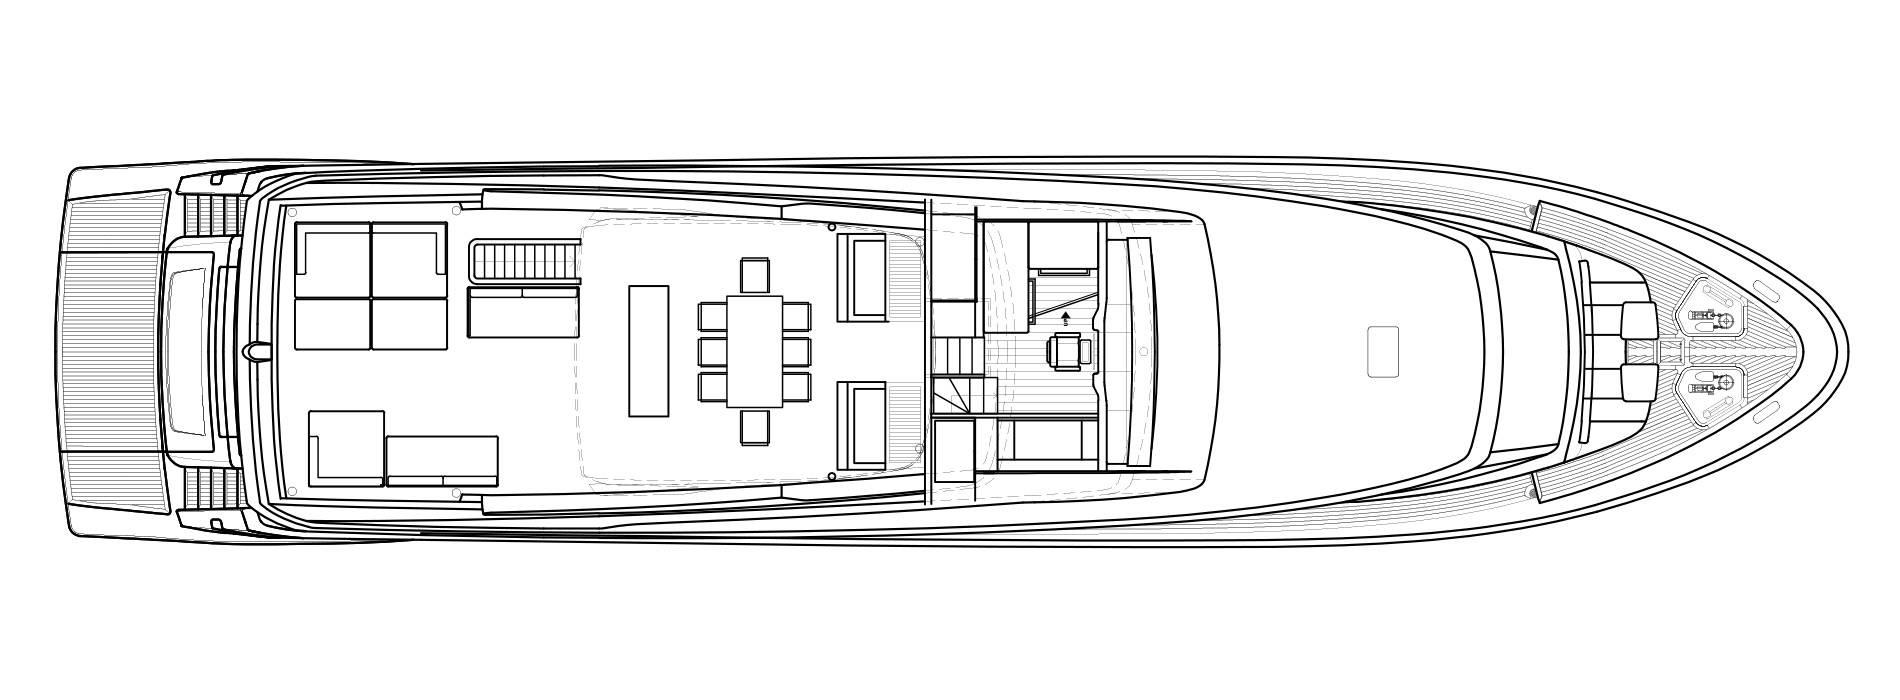 Sanlorenzo Yachts SL106 Flying bridge